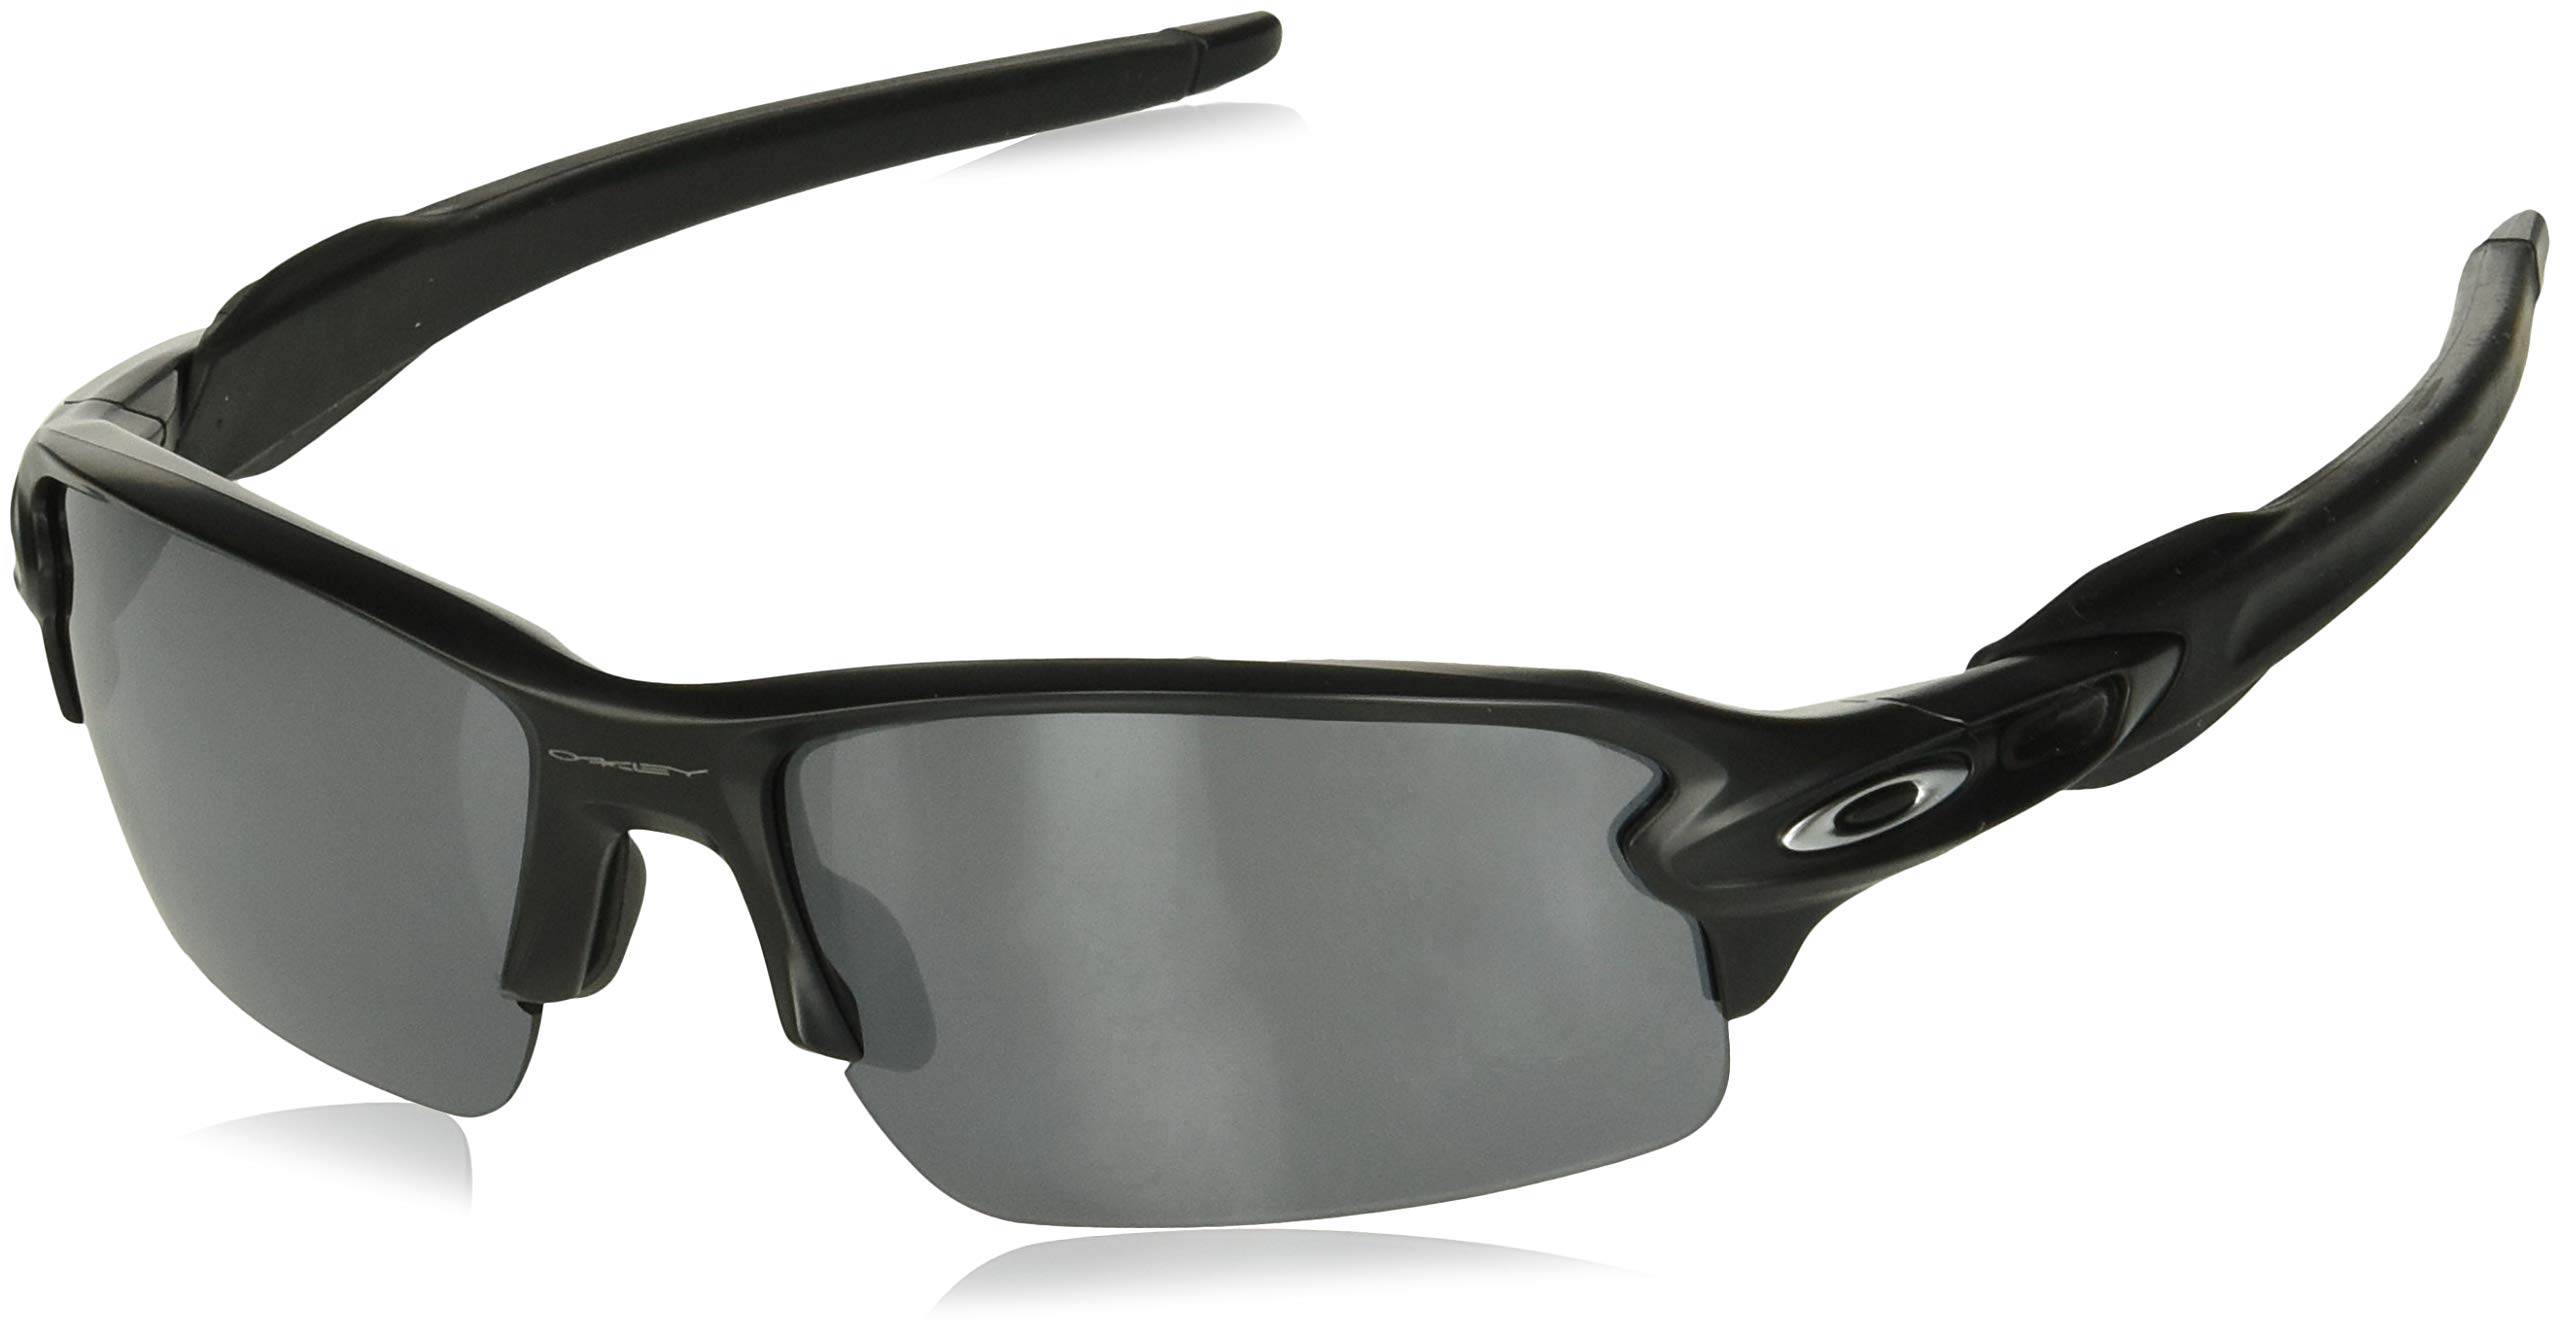 Oakley Men's OO9295 Flak 2.0 Rectangular Sunglasses, Matte Black/Black Iridium, 59 mm